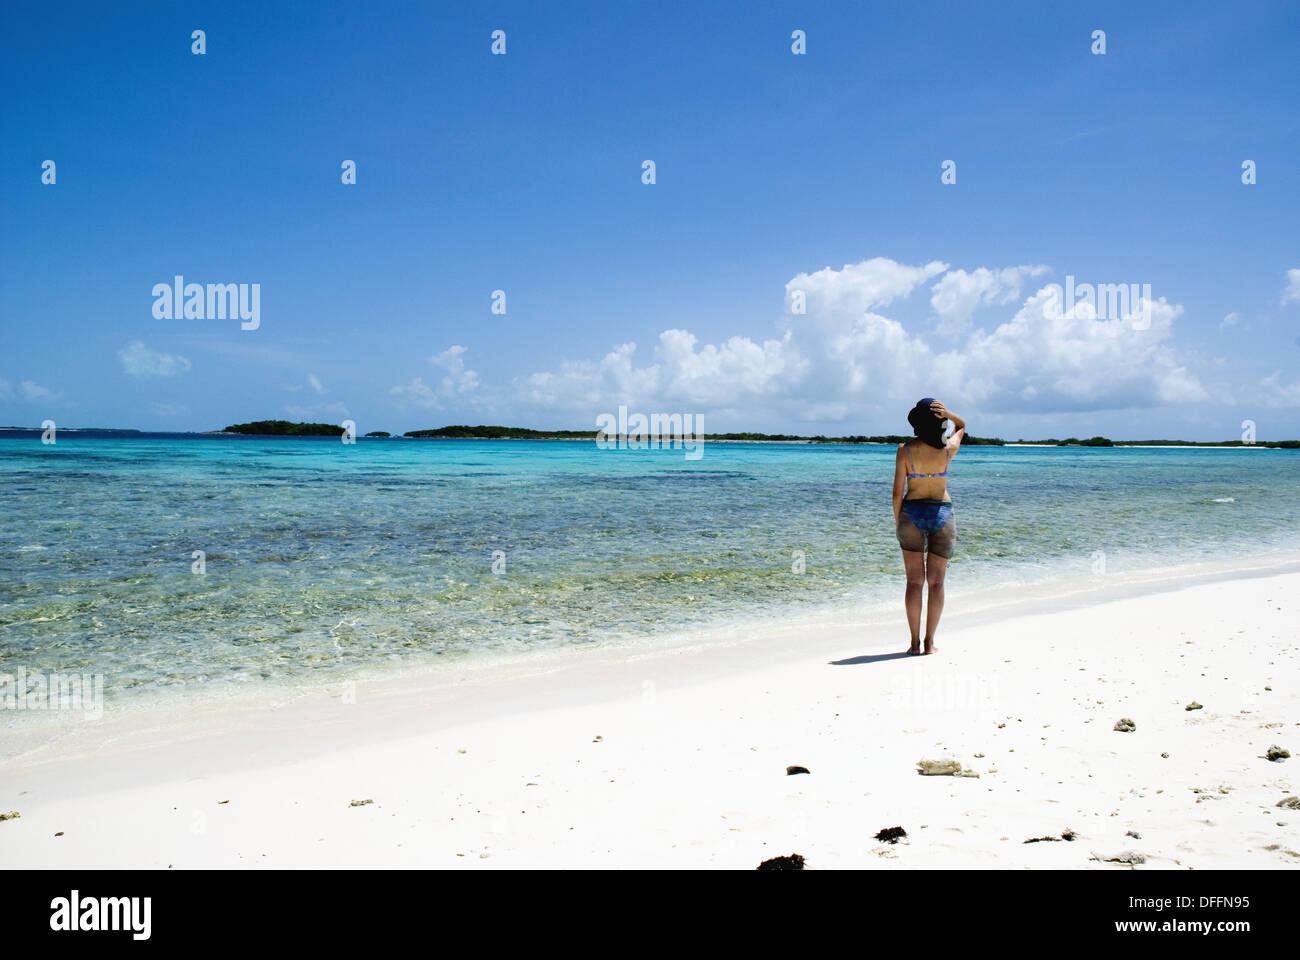 Venezuela Los Roques Crasqui Insel Frau Am Strand Stockfoto Bild